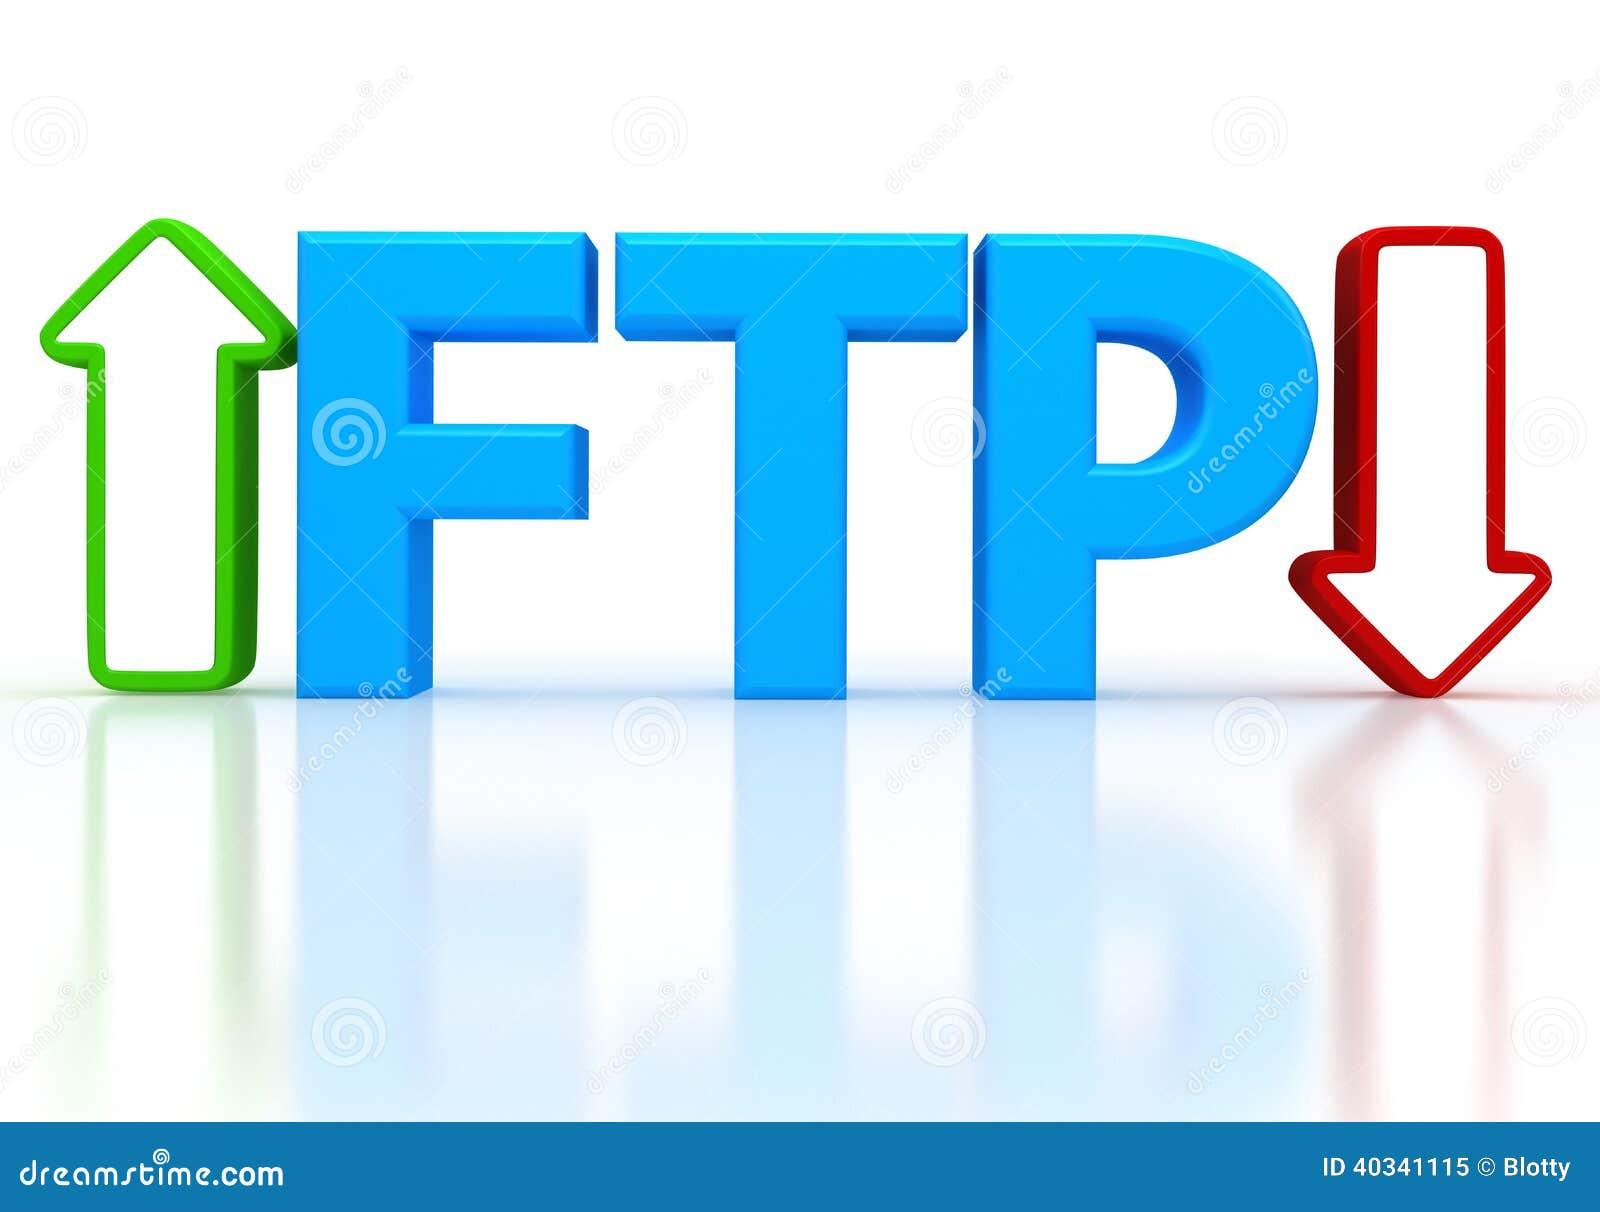 free gay file transfers